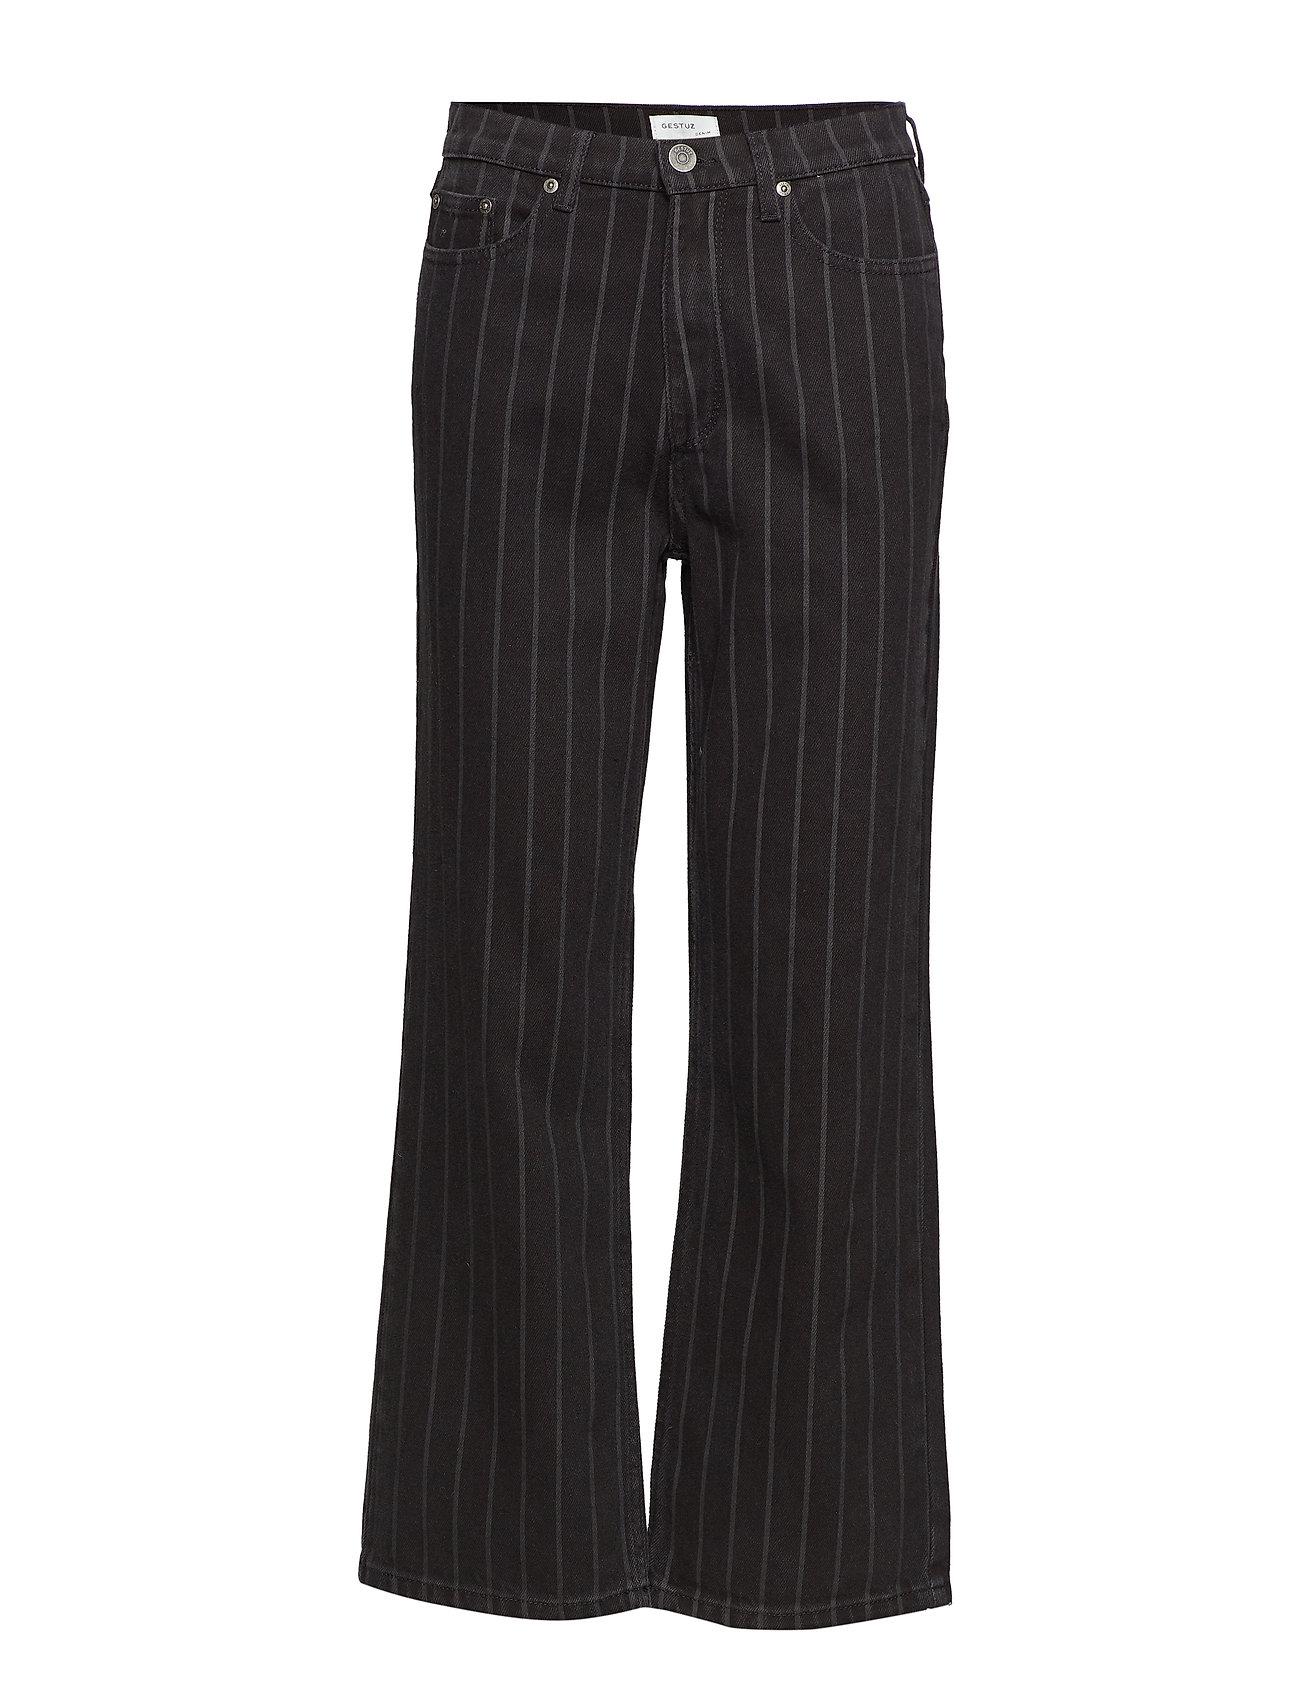 Gestuz Emma HW jeans SO19 - BLACK PINSTRIPE